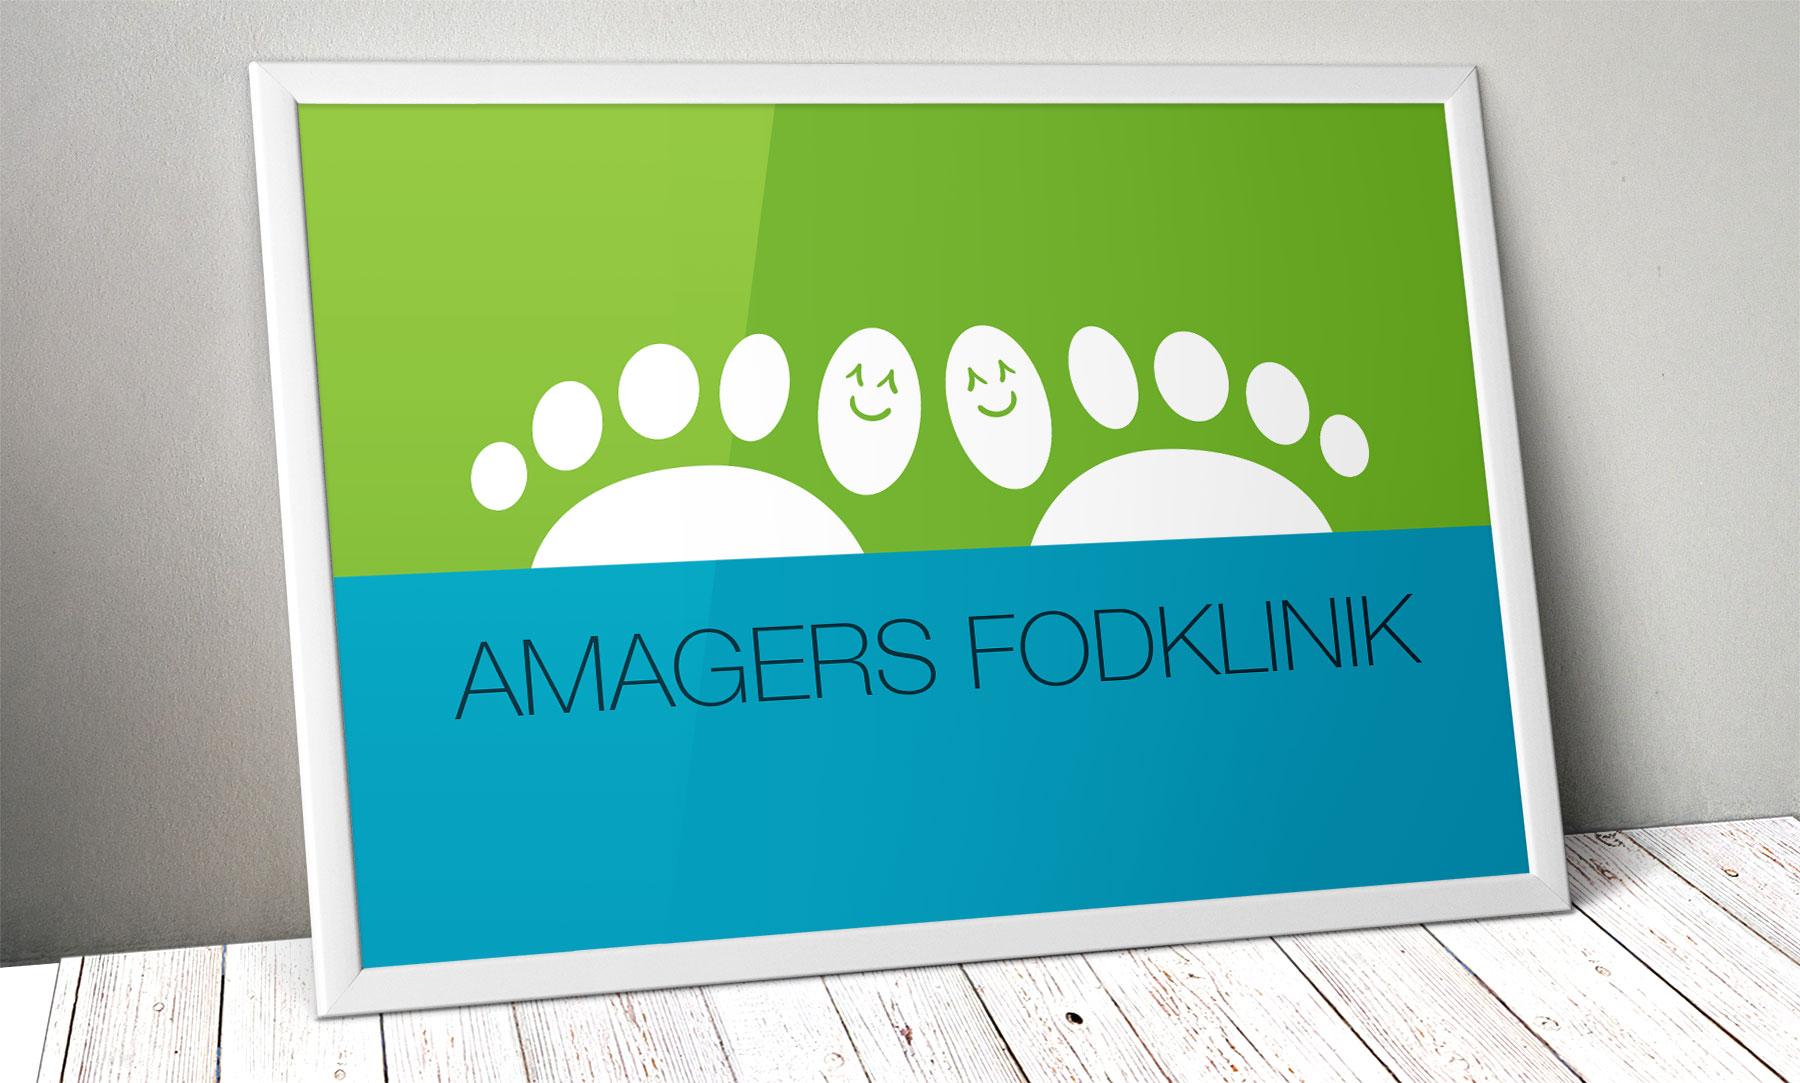 Amagers Fodklinik: Poster